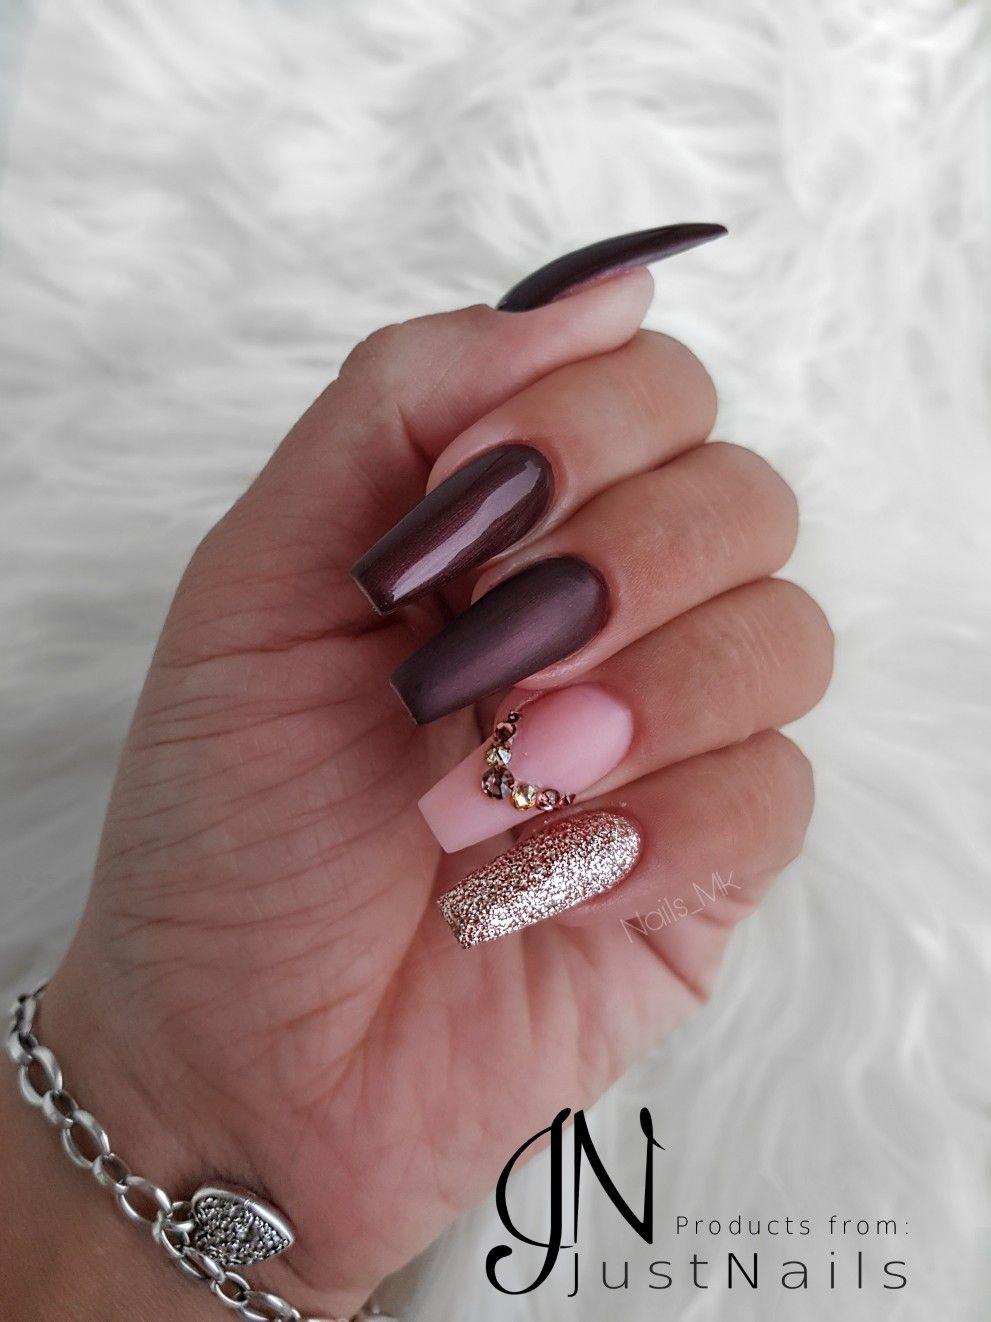 Pin by danica berube on i love nails in